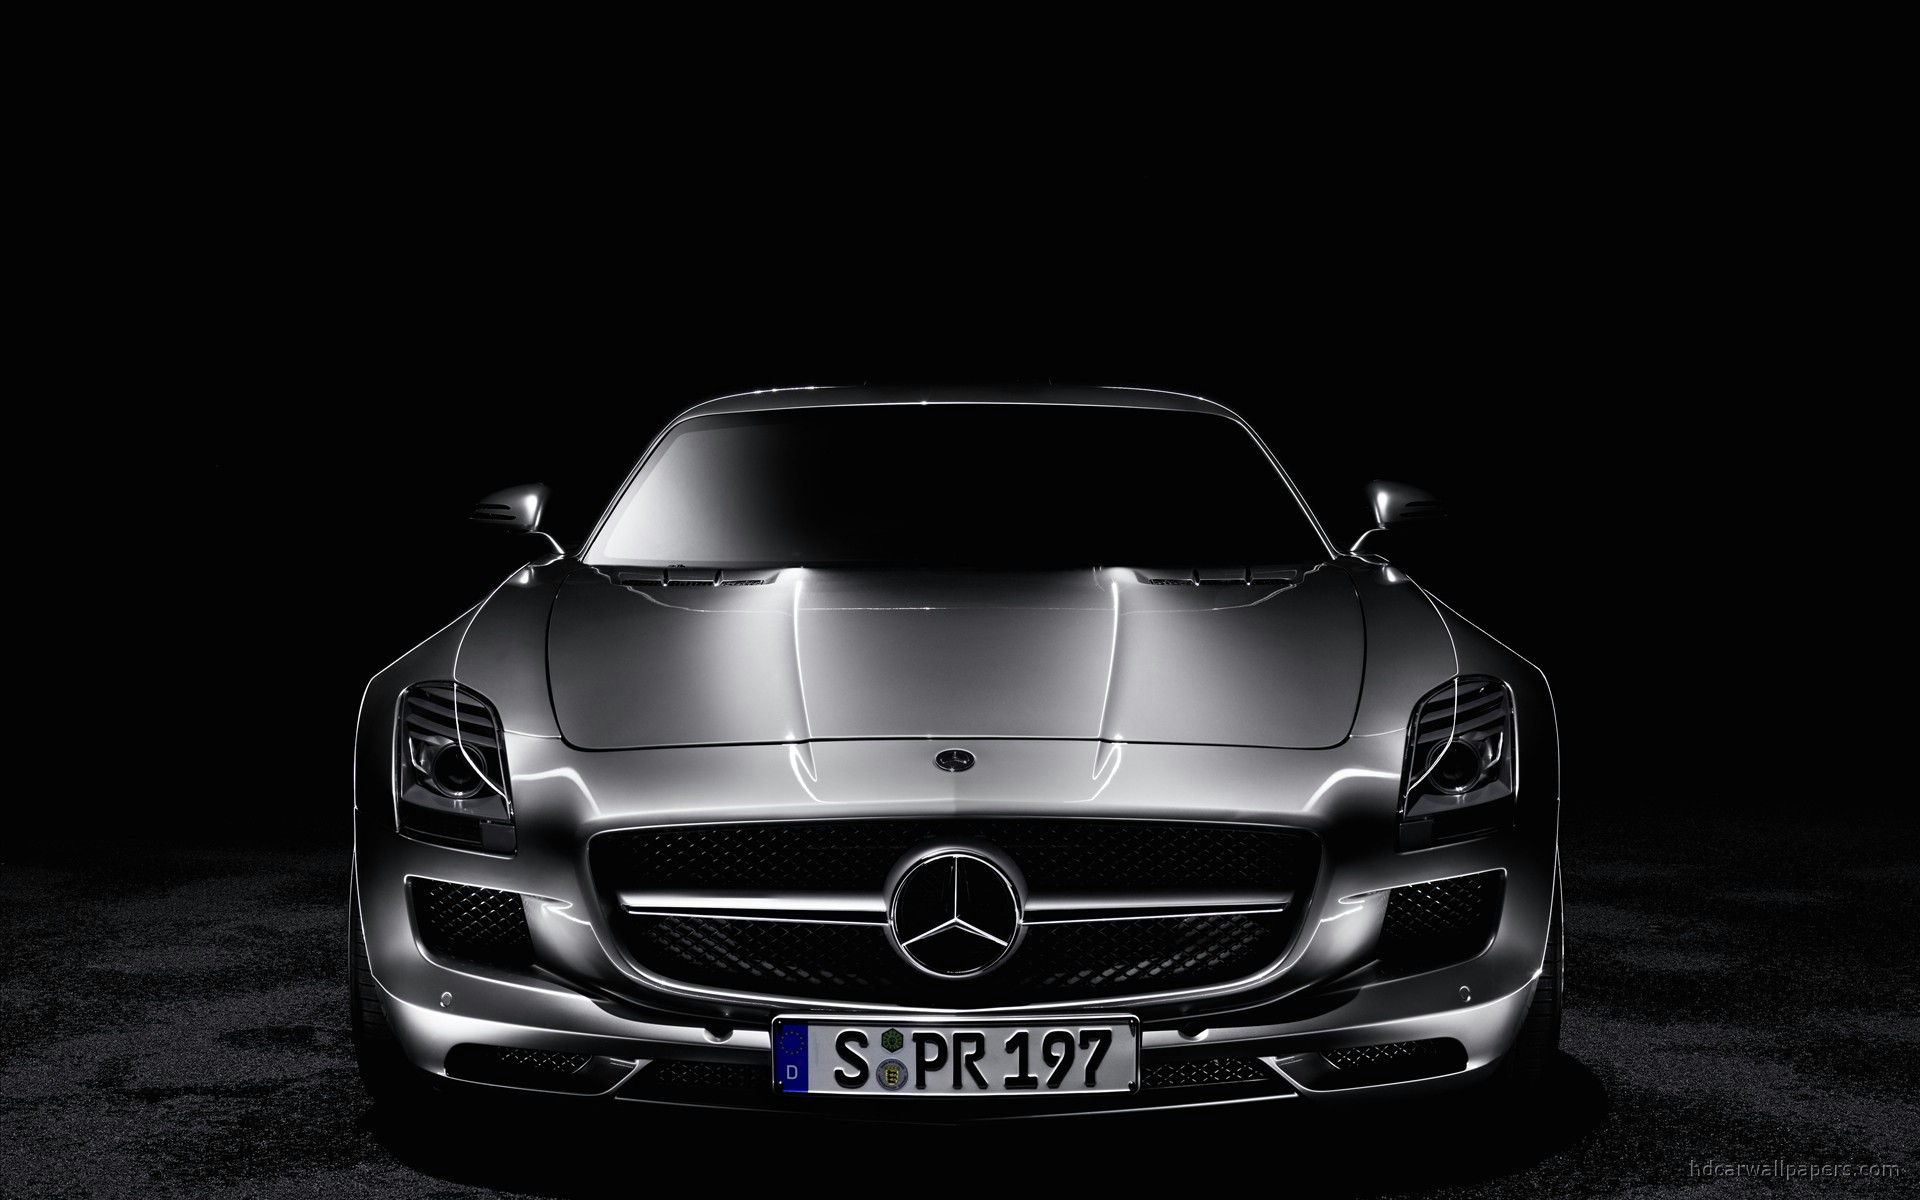 Cool Mercedes Benz Wallpapers - WallpaperSafari